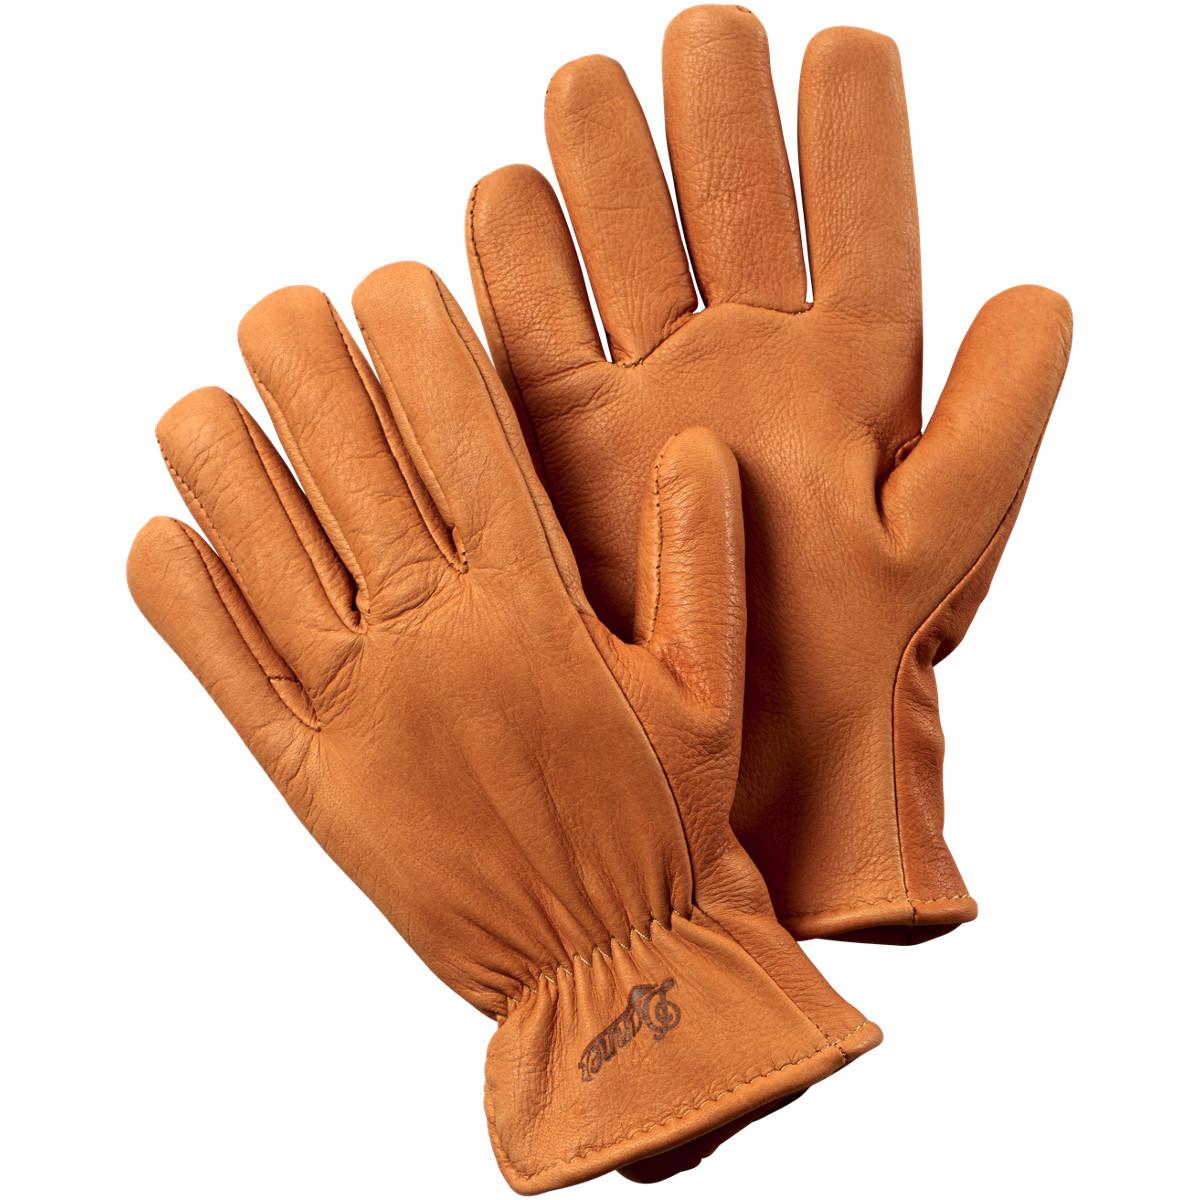 Glove - Deerskin - Pile Lined Saddle